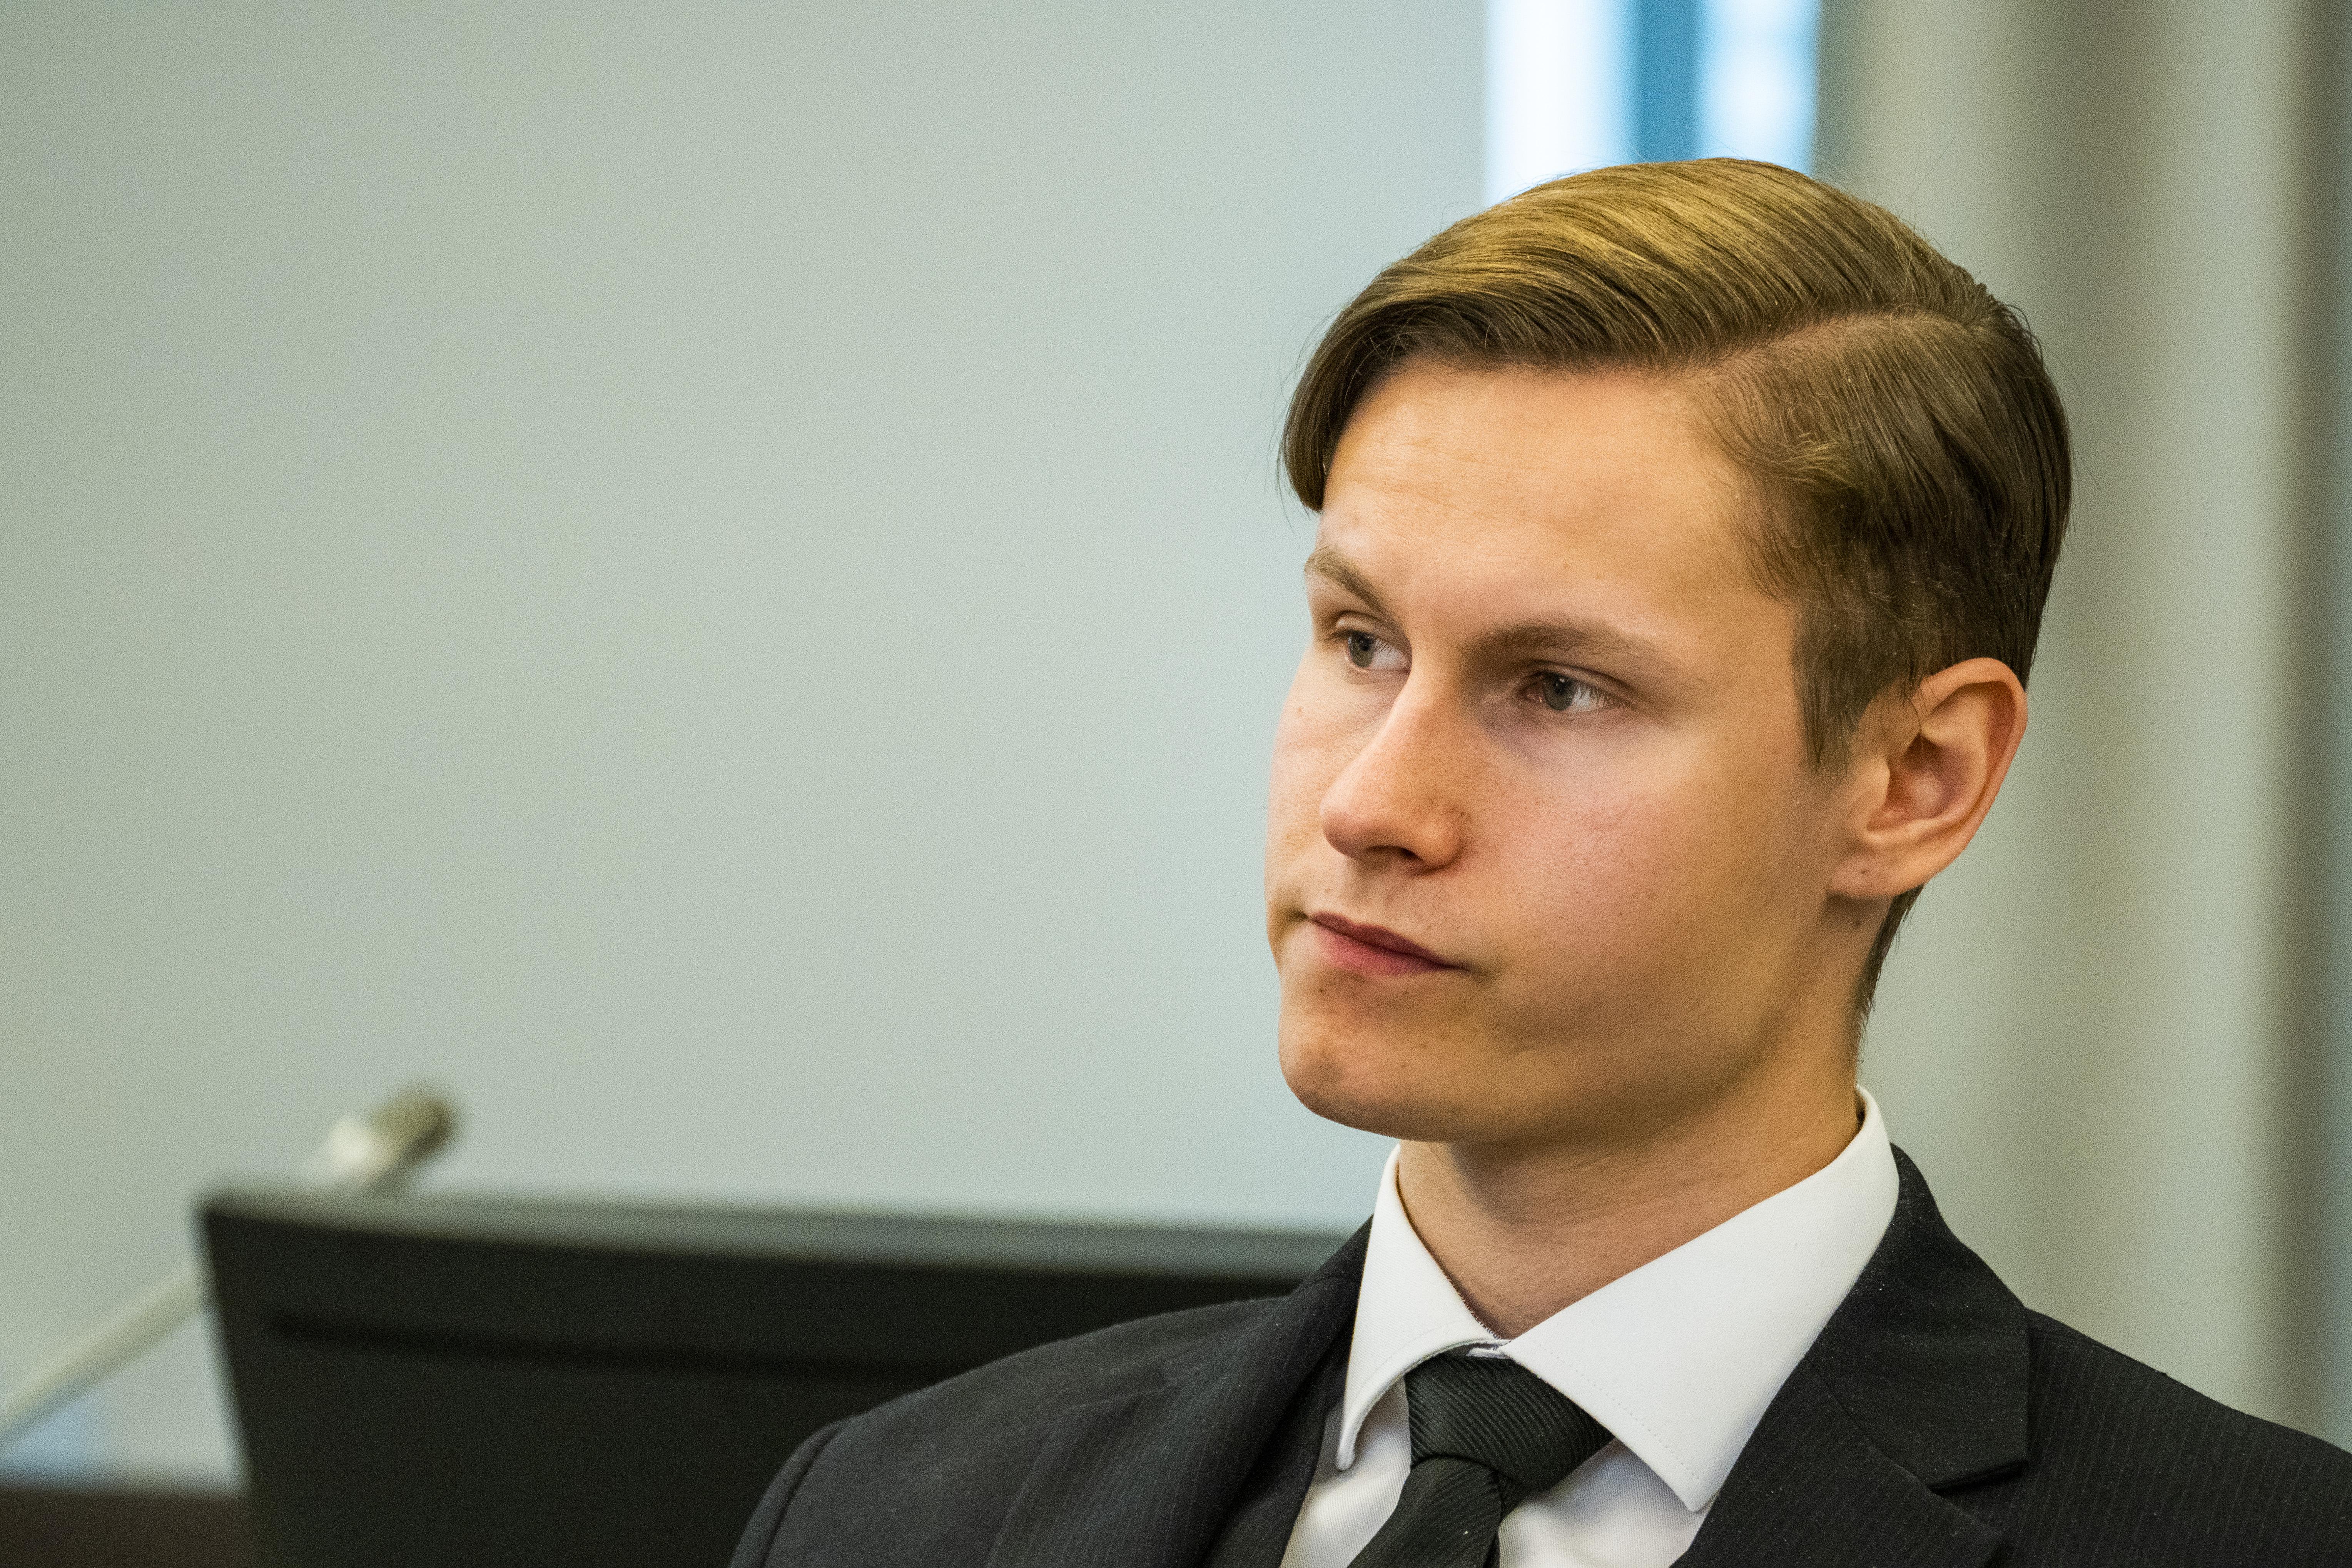 21 év börtönre ítélték a mecsetnél lövöldöző Philip Manshaust Norvégiában